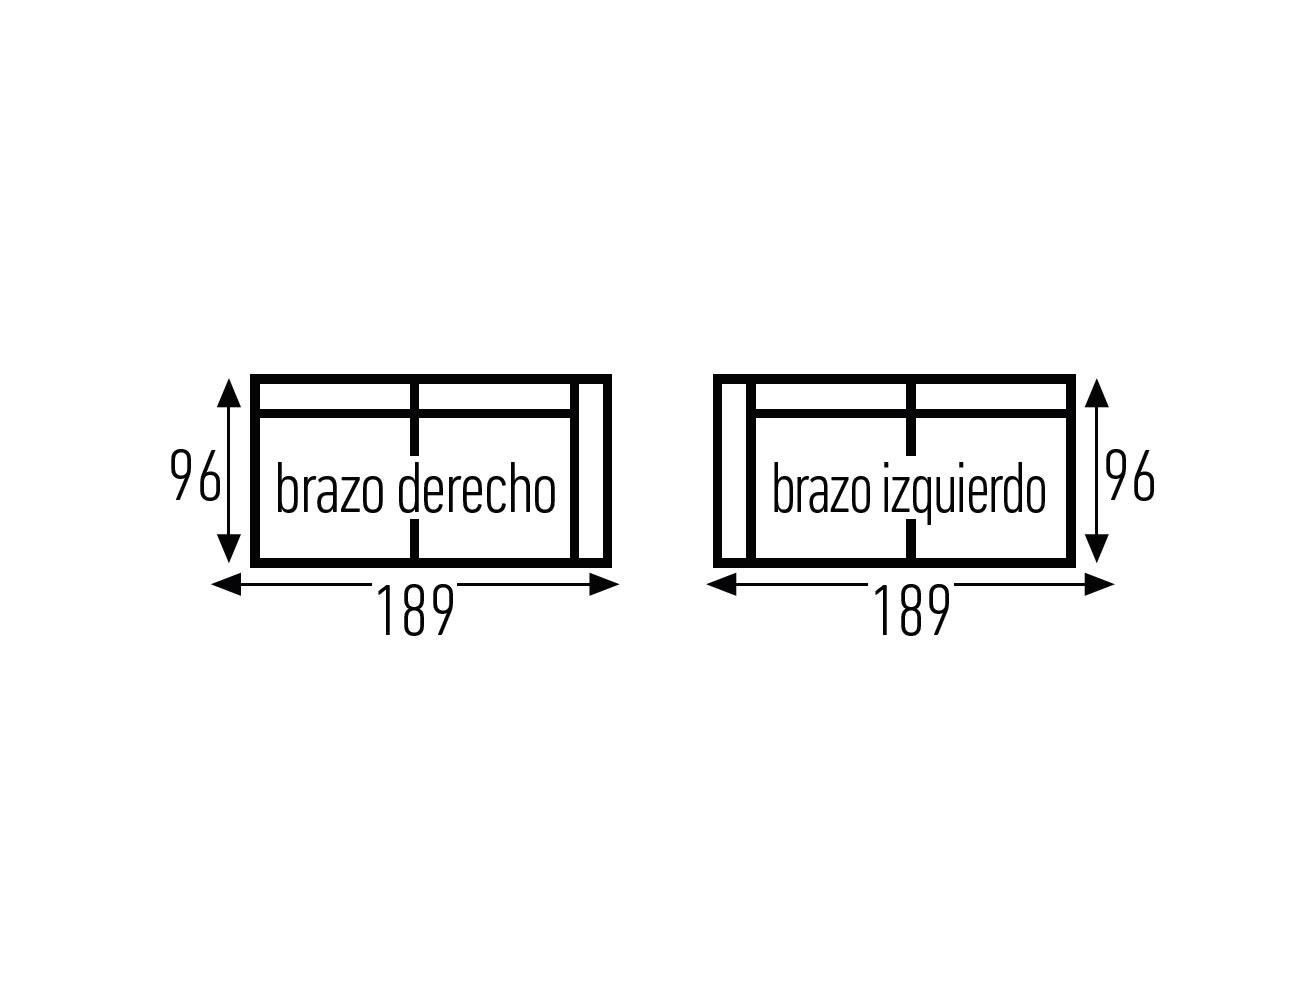 Croquis 3p sin 1 brazo 1892